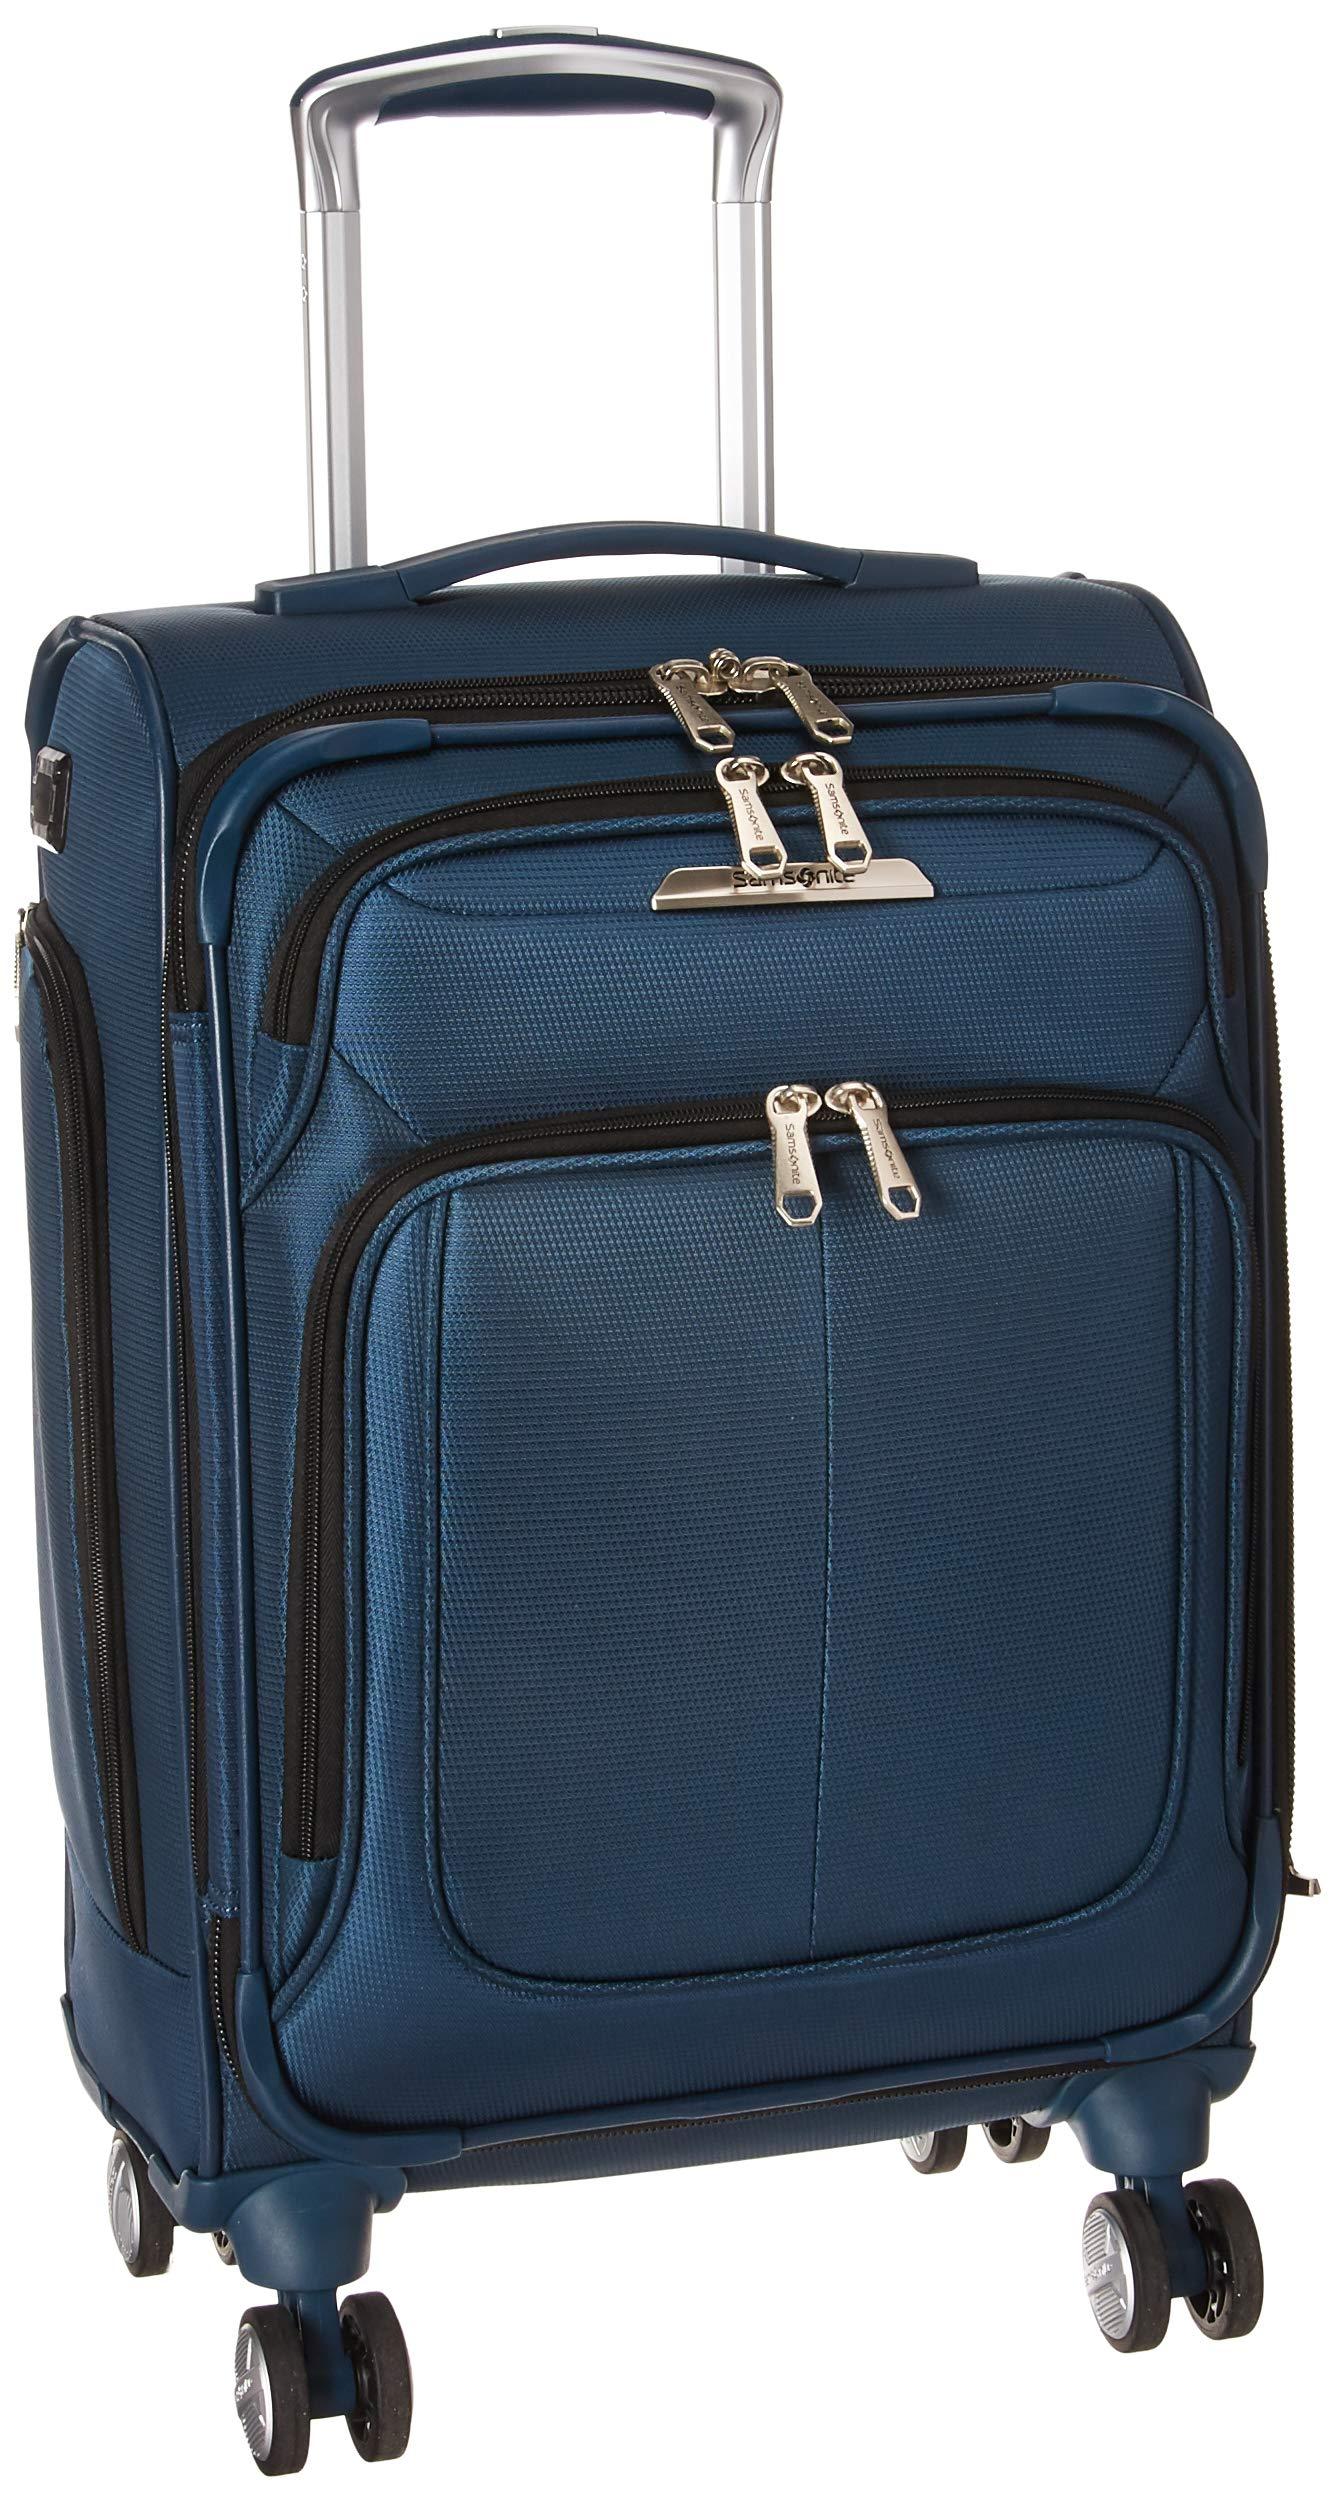 Samsonite Carry On, Mediterranean Blue